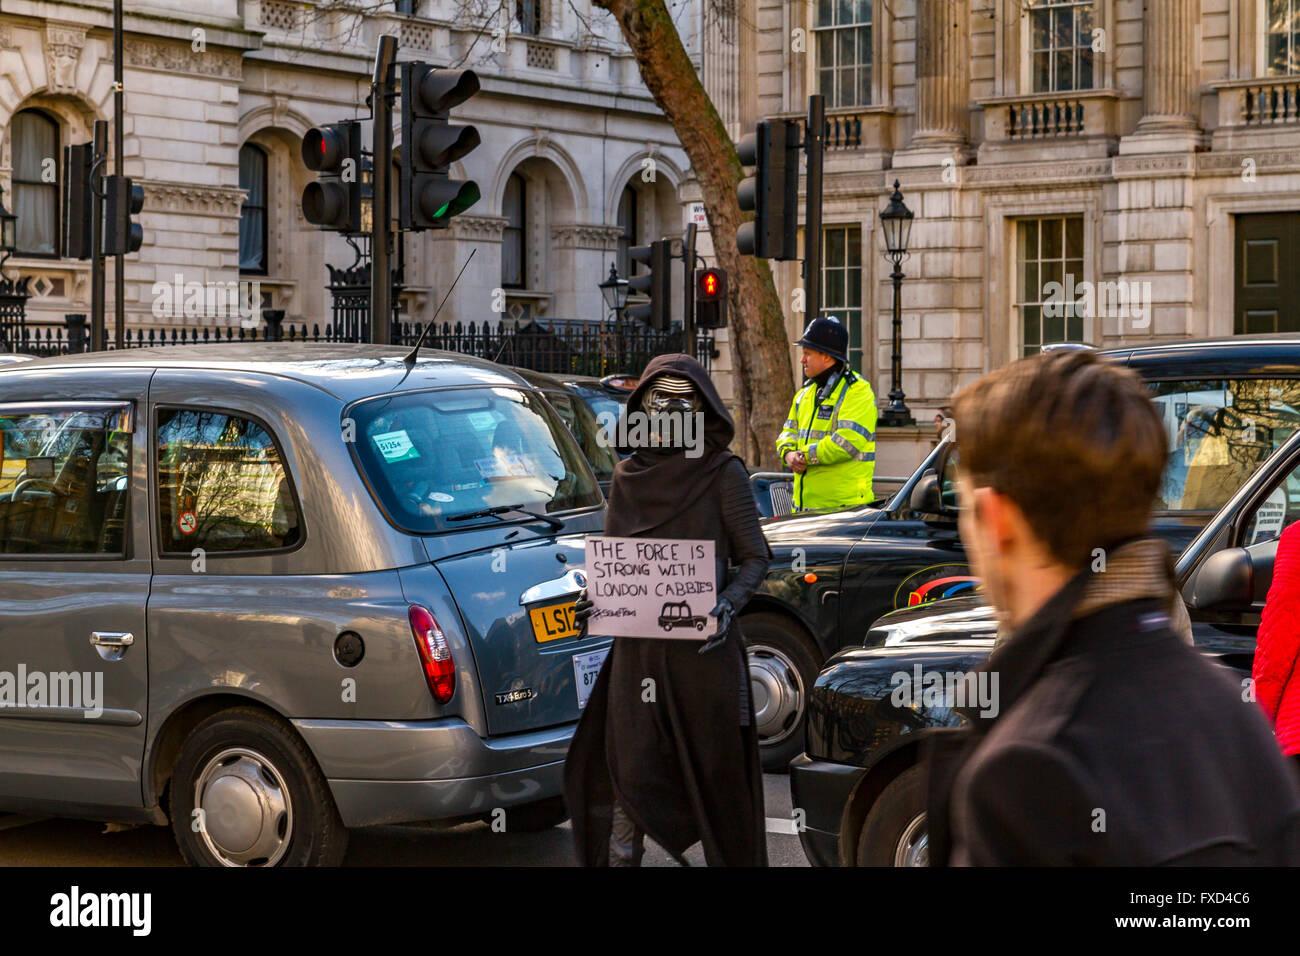 London Taxi Drivers Association Protest gegen Uber in London, hundert der schwarzen Londoner Taxis blockade Whitehall Stockbild